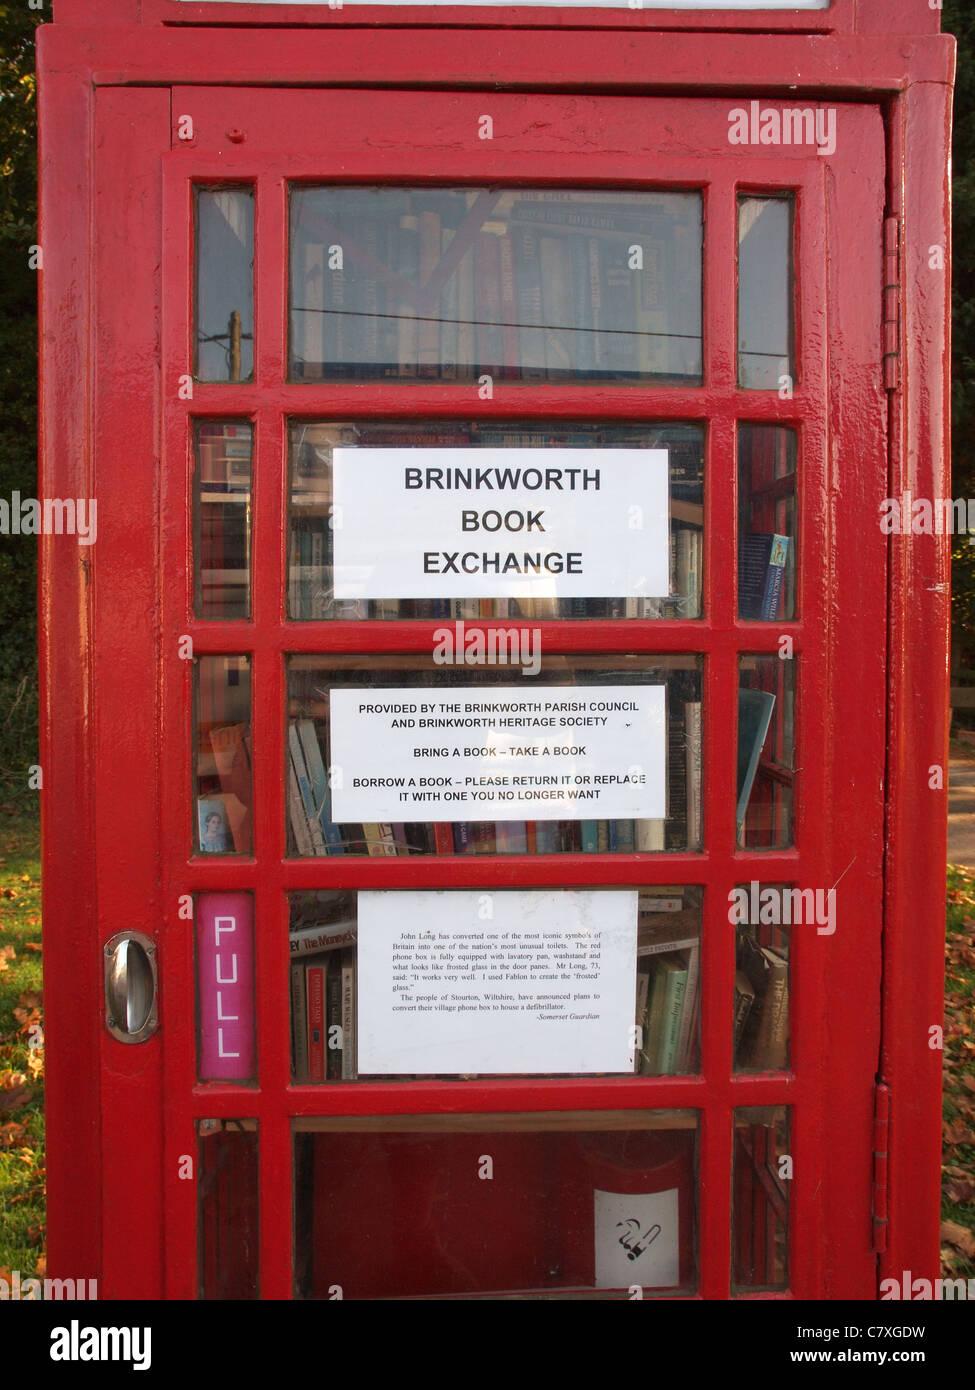 Book Exchange in Red Phone Box, Brinkworth,  Wiltshire - Stock Image